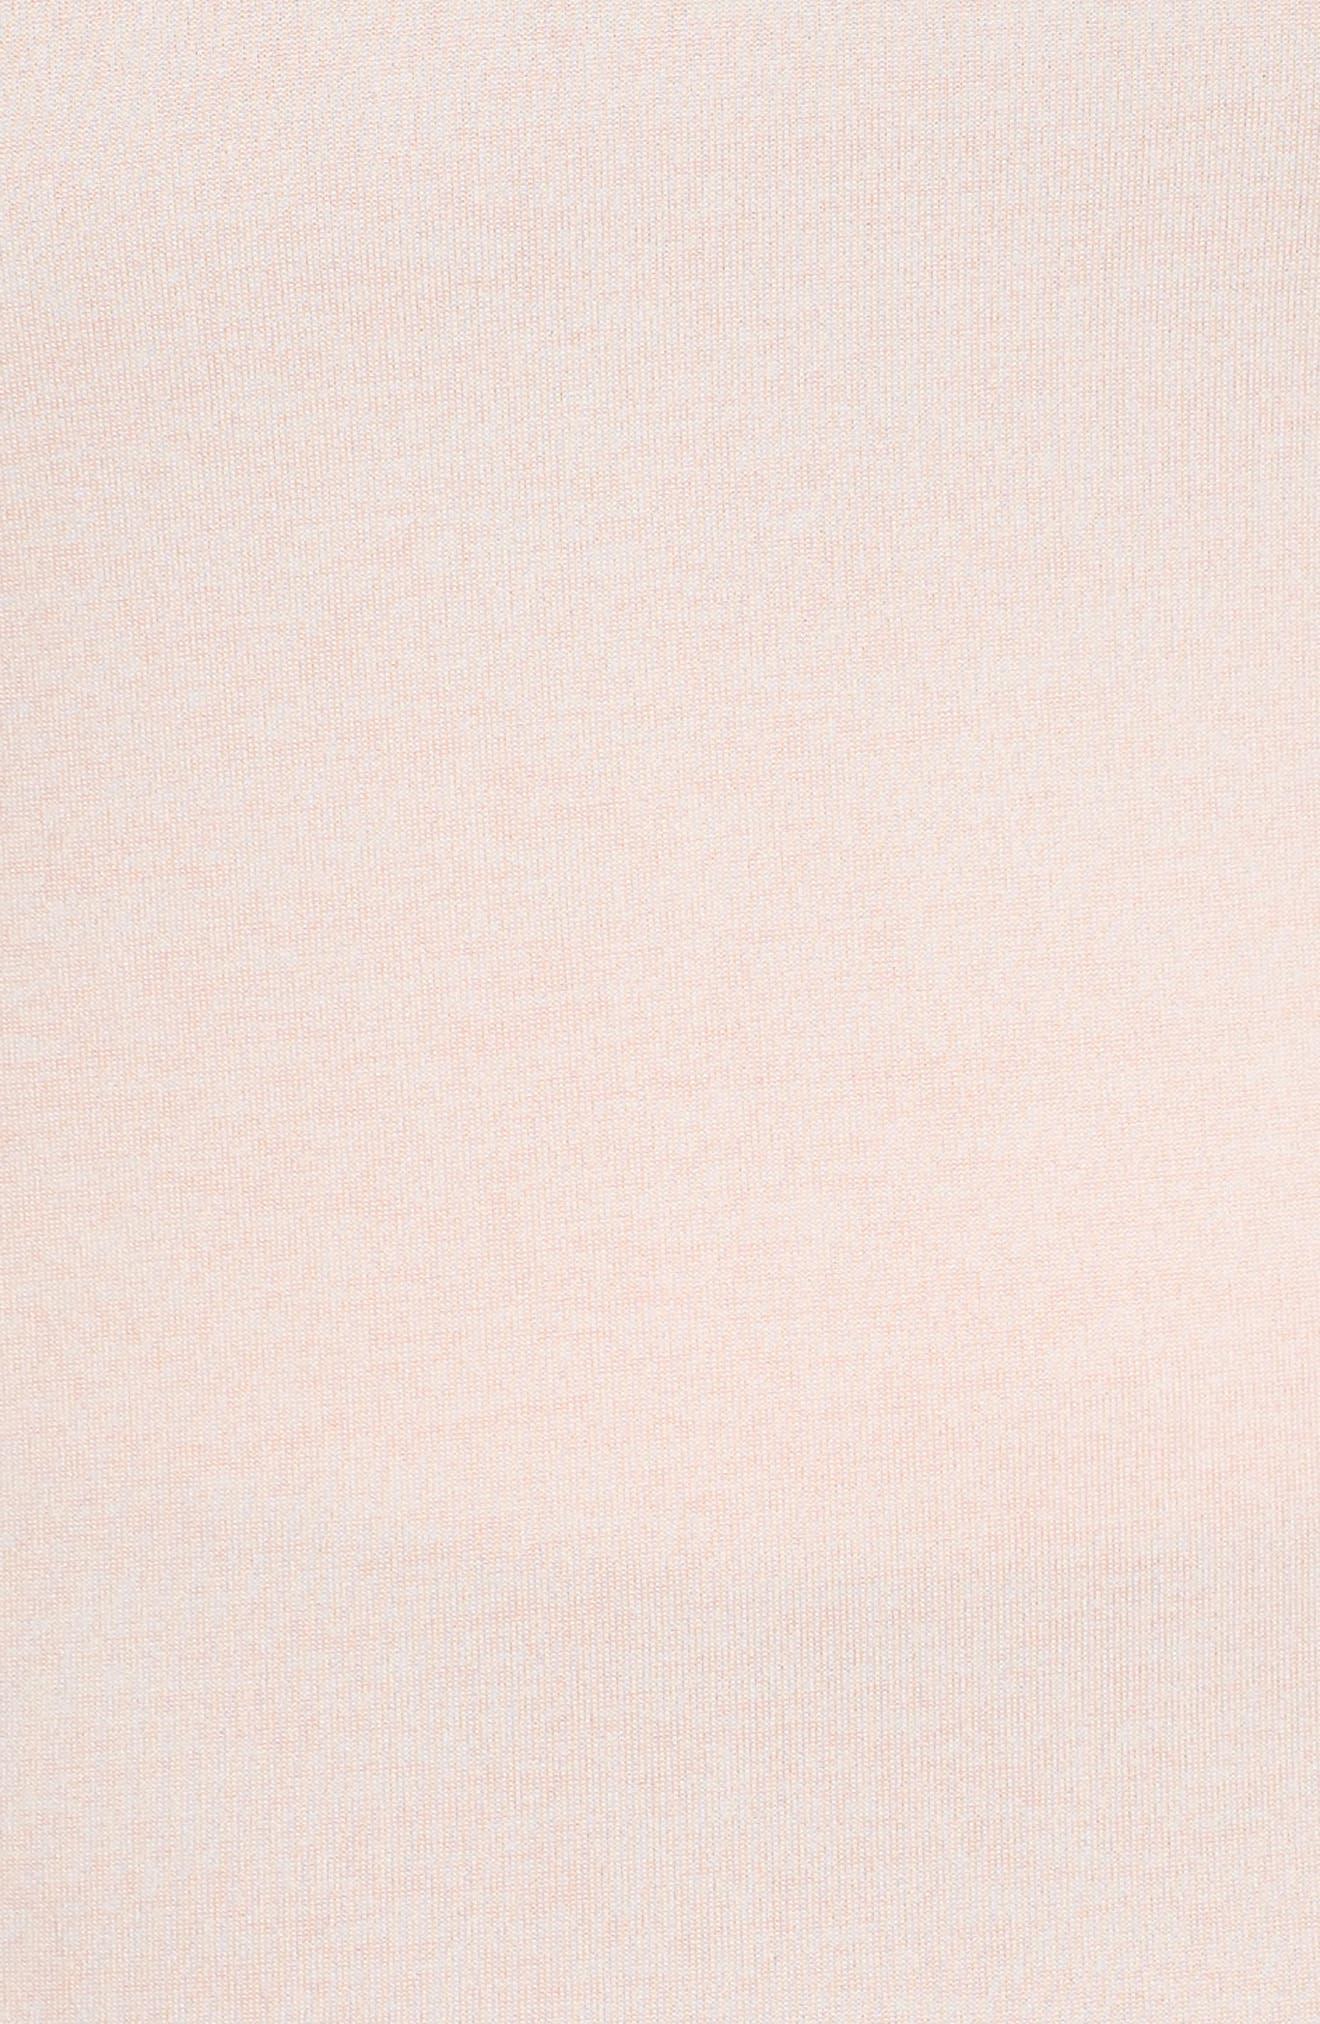 Dry Legend Training Tee,                             Alternate thumbnail 4, color,                             Storm Pink/ White/ White